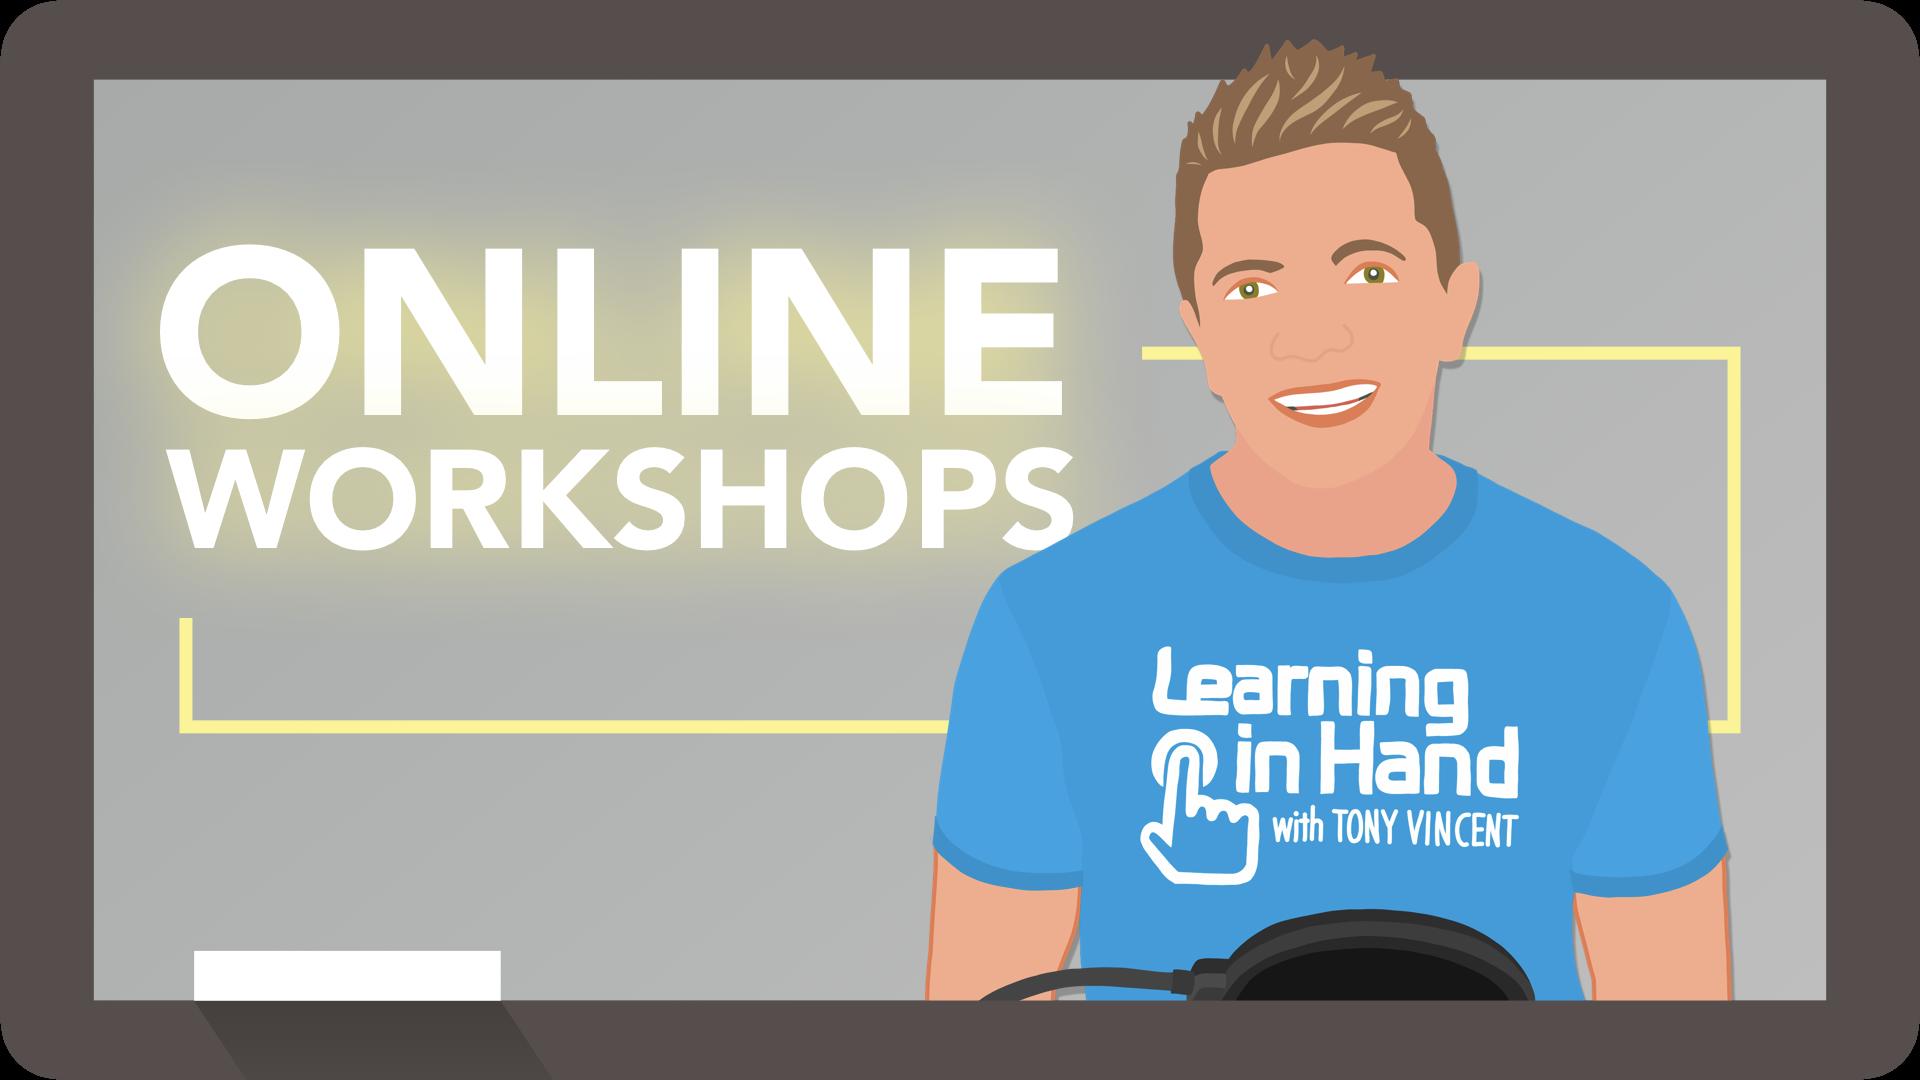 Online Workshops with Tony Vincent